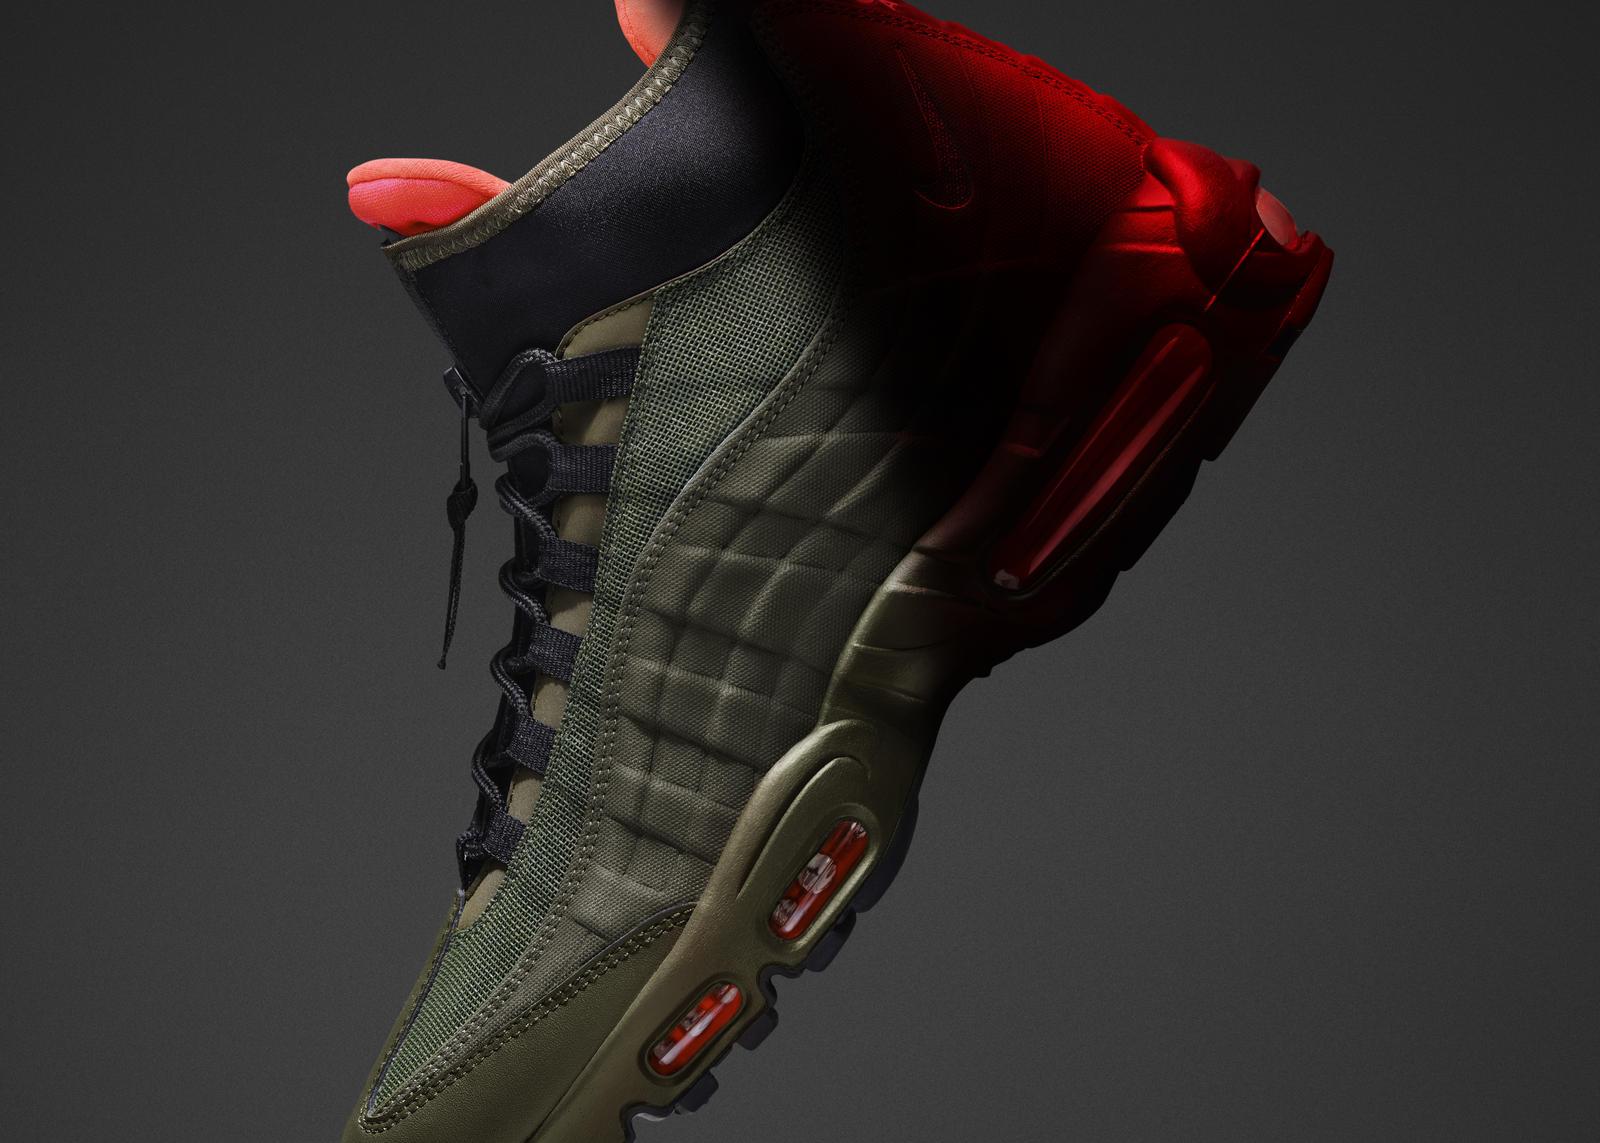 Sneakerboots Holiday Nike 2015 Het Collectienieuws 5cqEFfcxw8